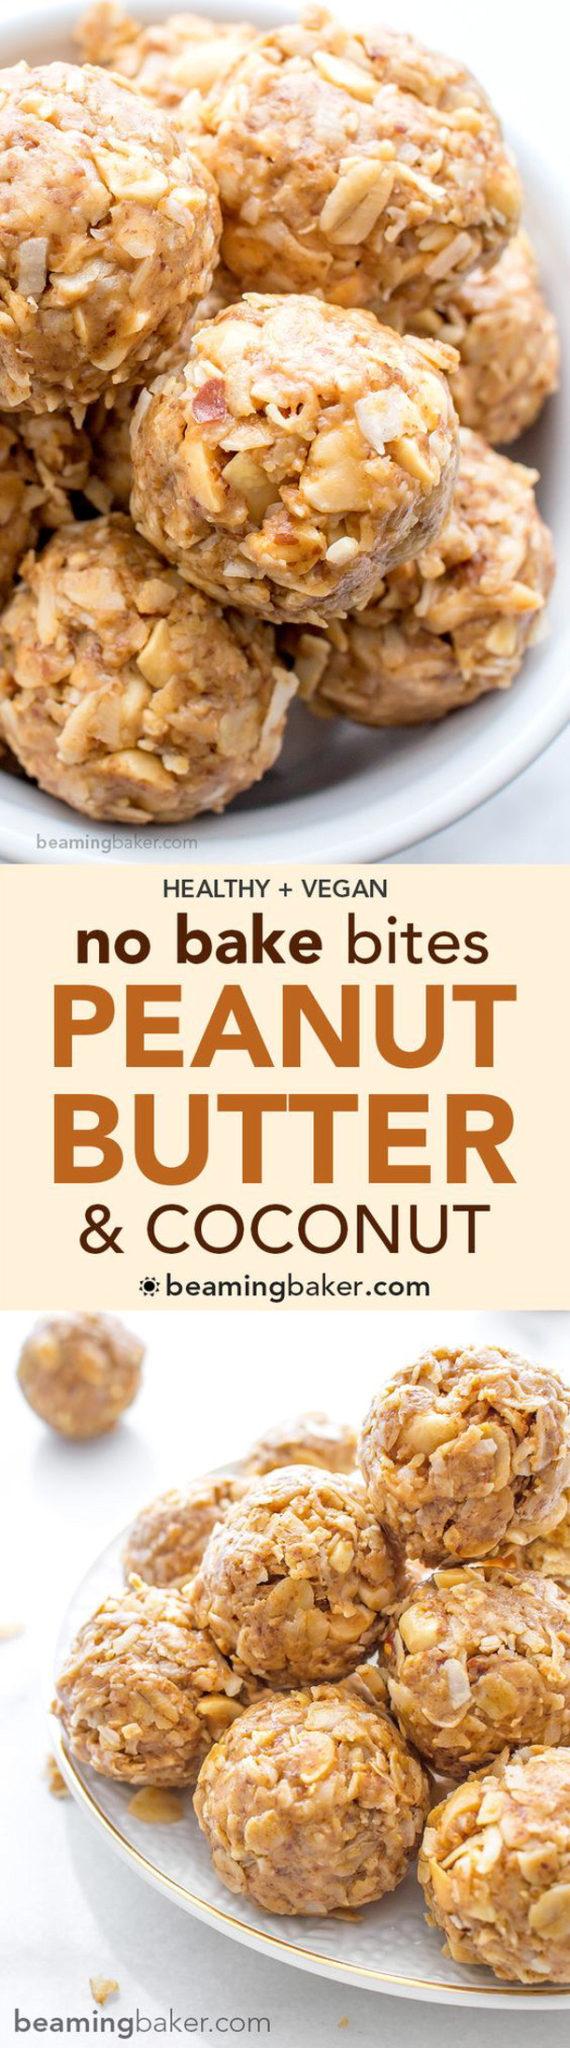 Healthy Snacks - No Bake Peanut Butter Coconut Bites - Vegan and Gluten Free Recipe via Beaming Baker